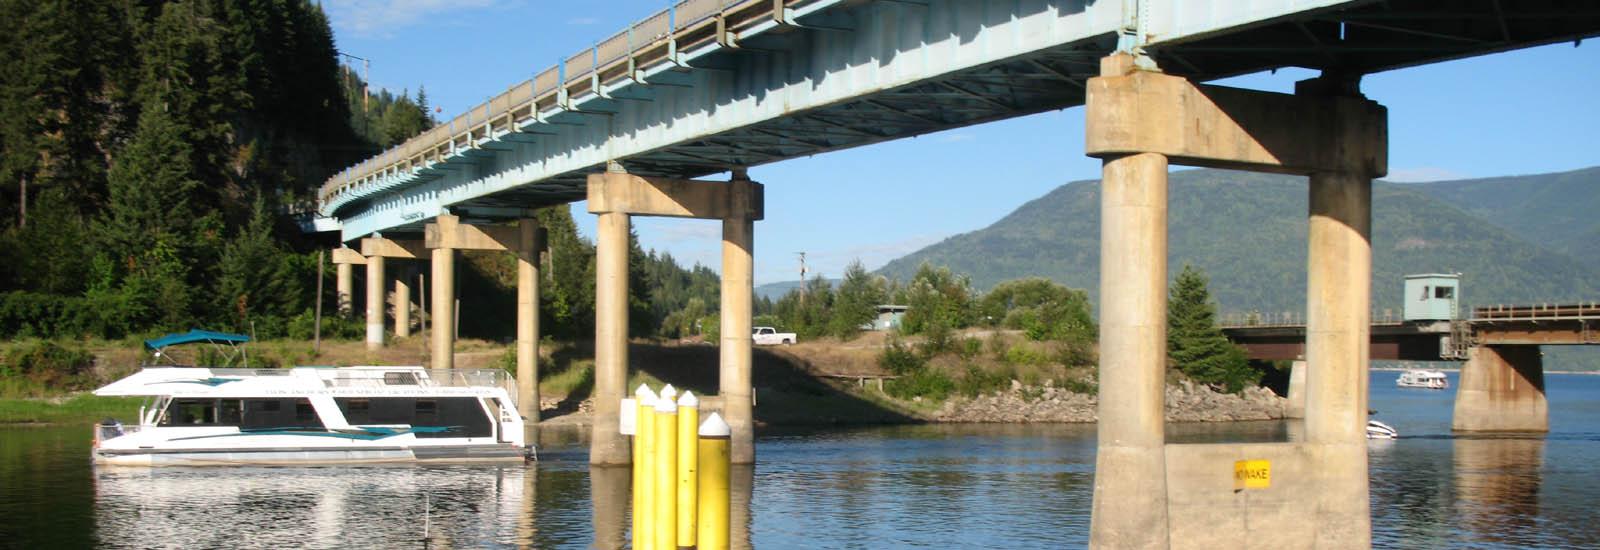 Sicamous Bridge with houseboat -sliver